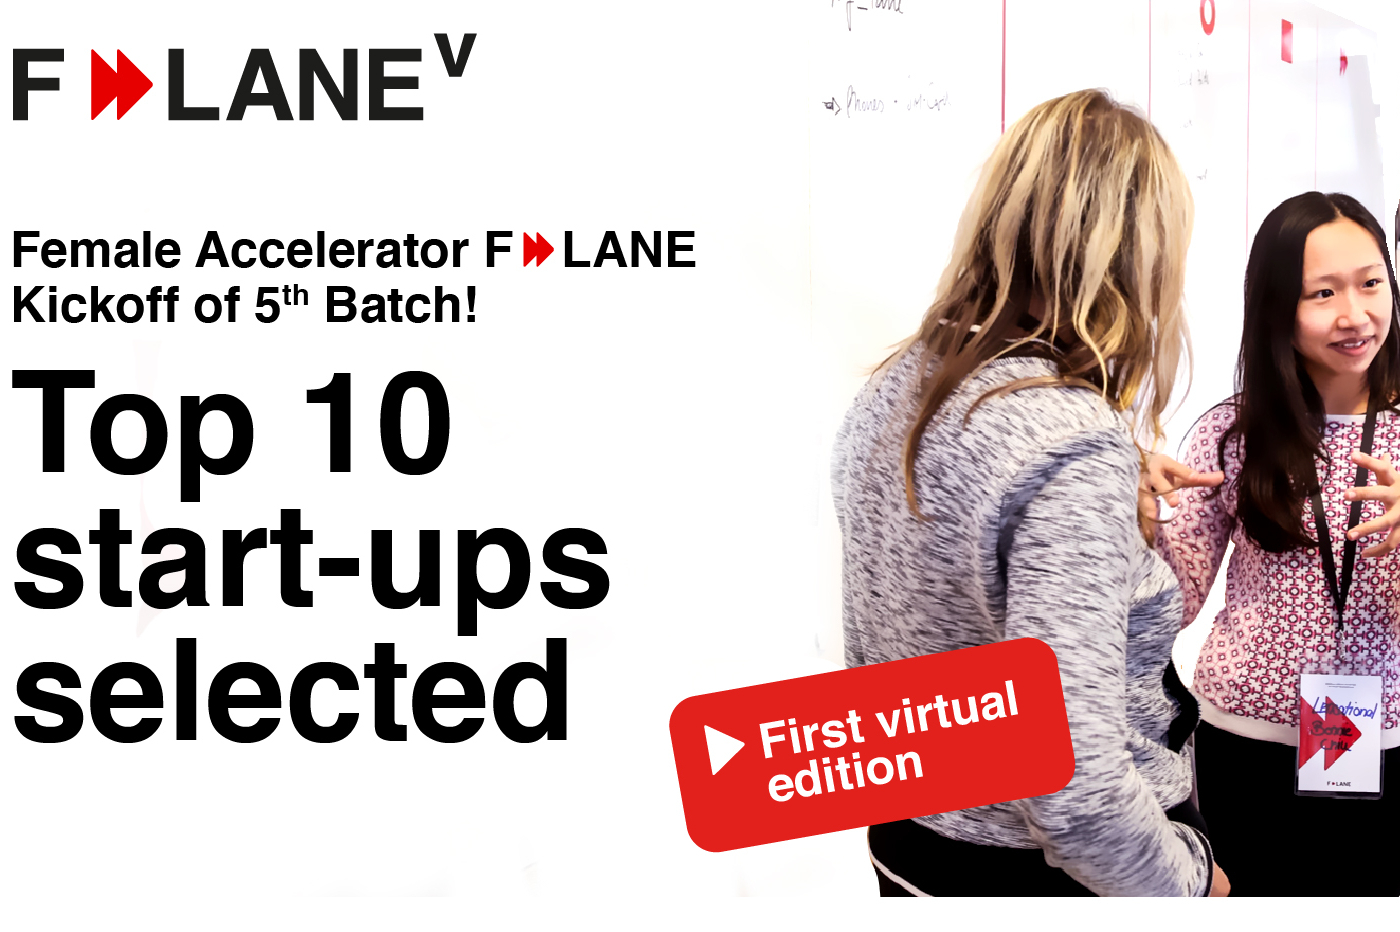 F-LANE 2020: Empowering women worldwide with technology